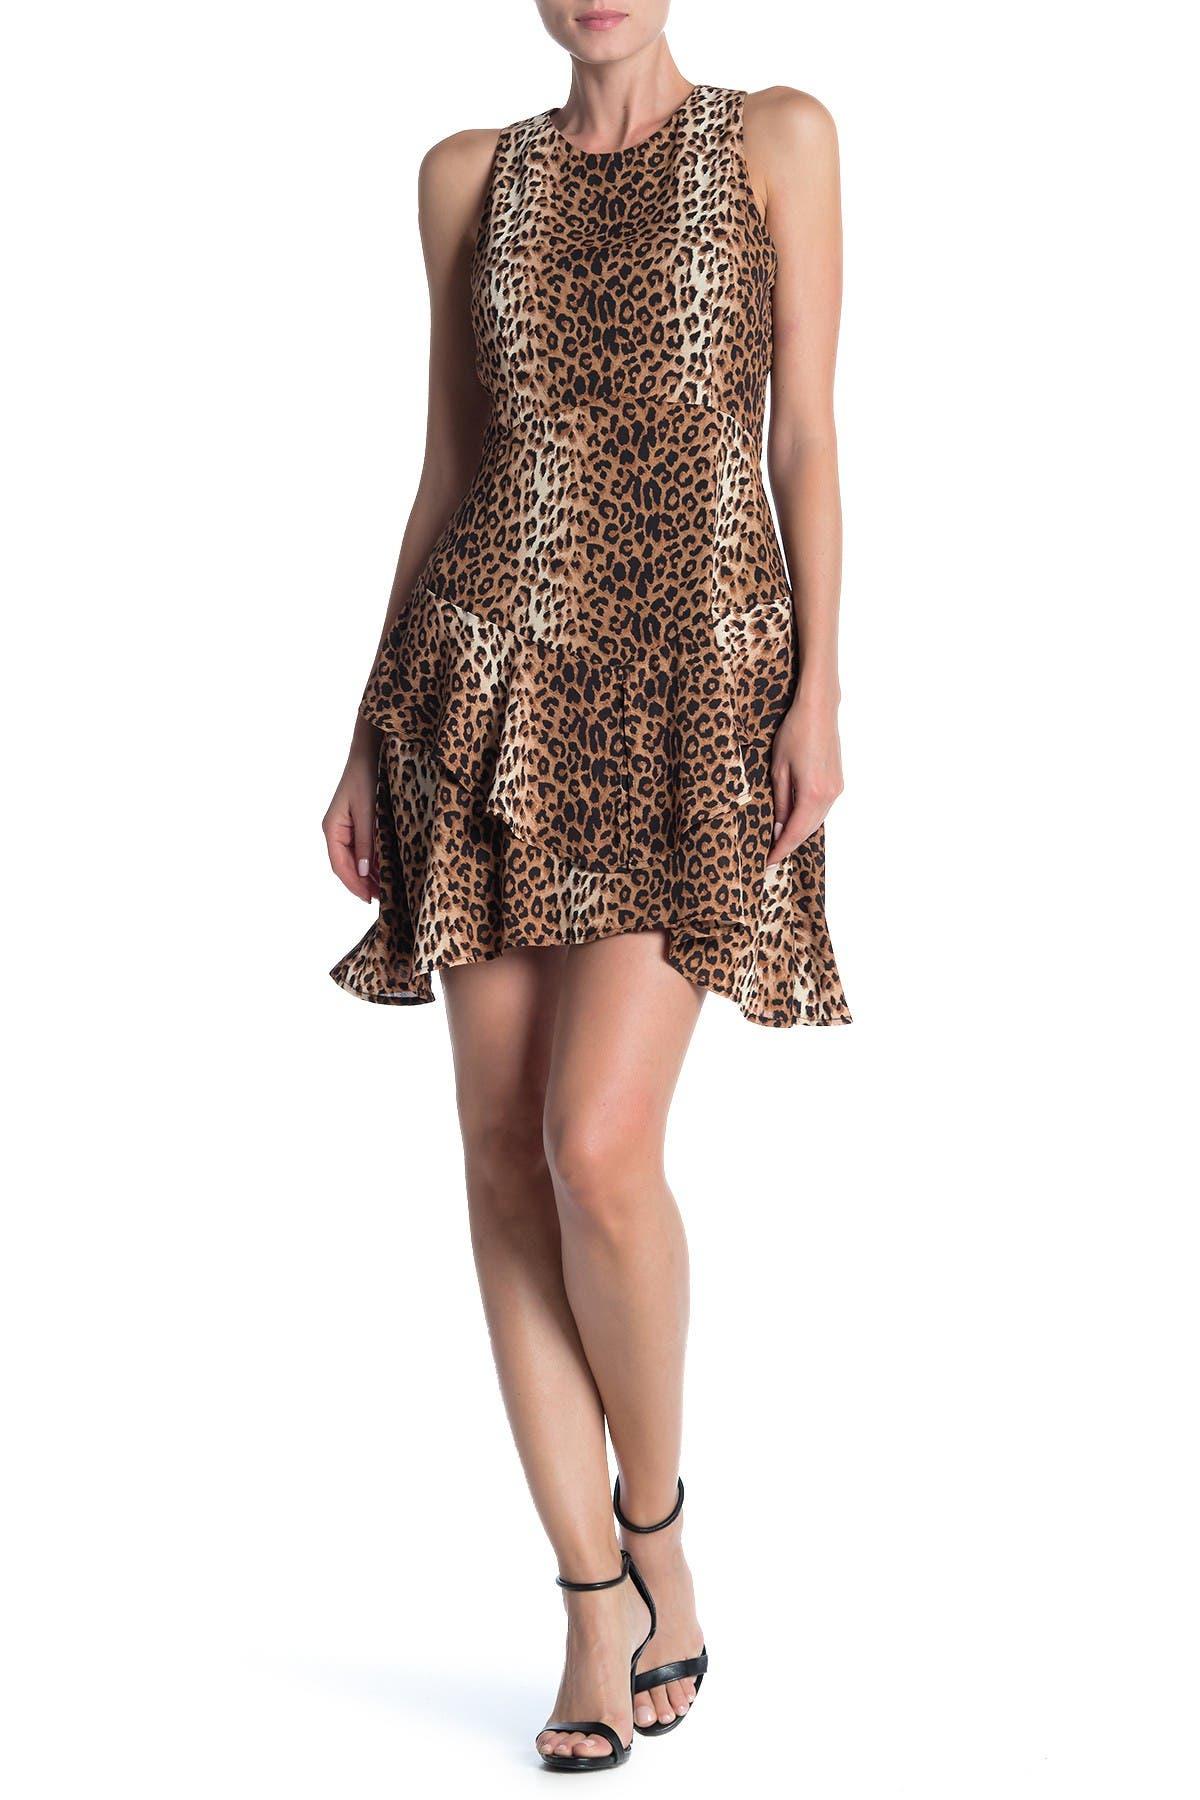 Image of 19 Cooper Leopard Print Sleeveless Ruffled Mini Dress